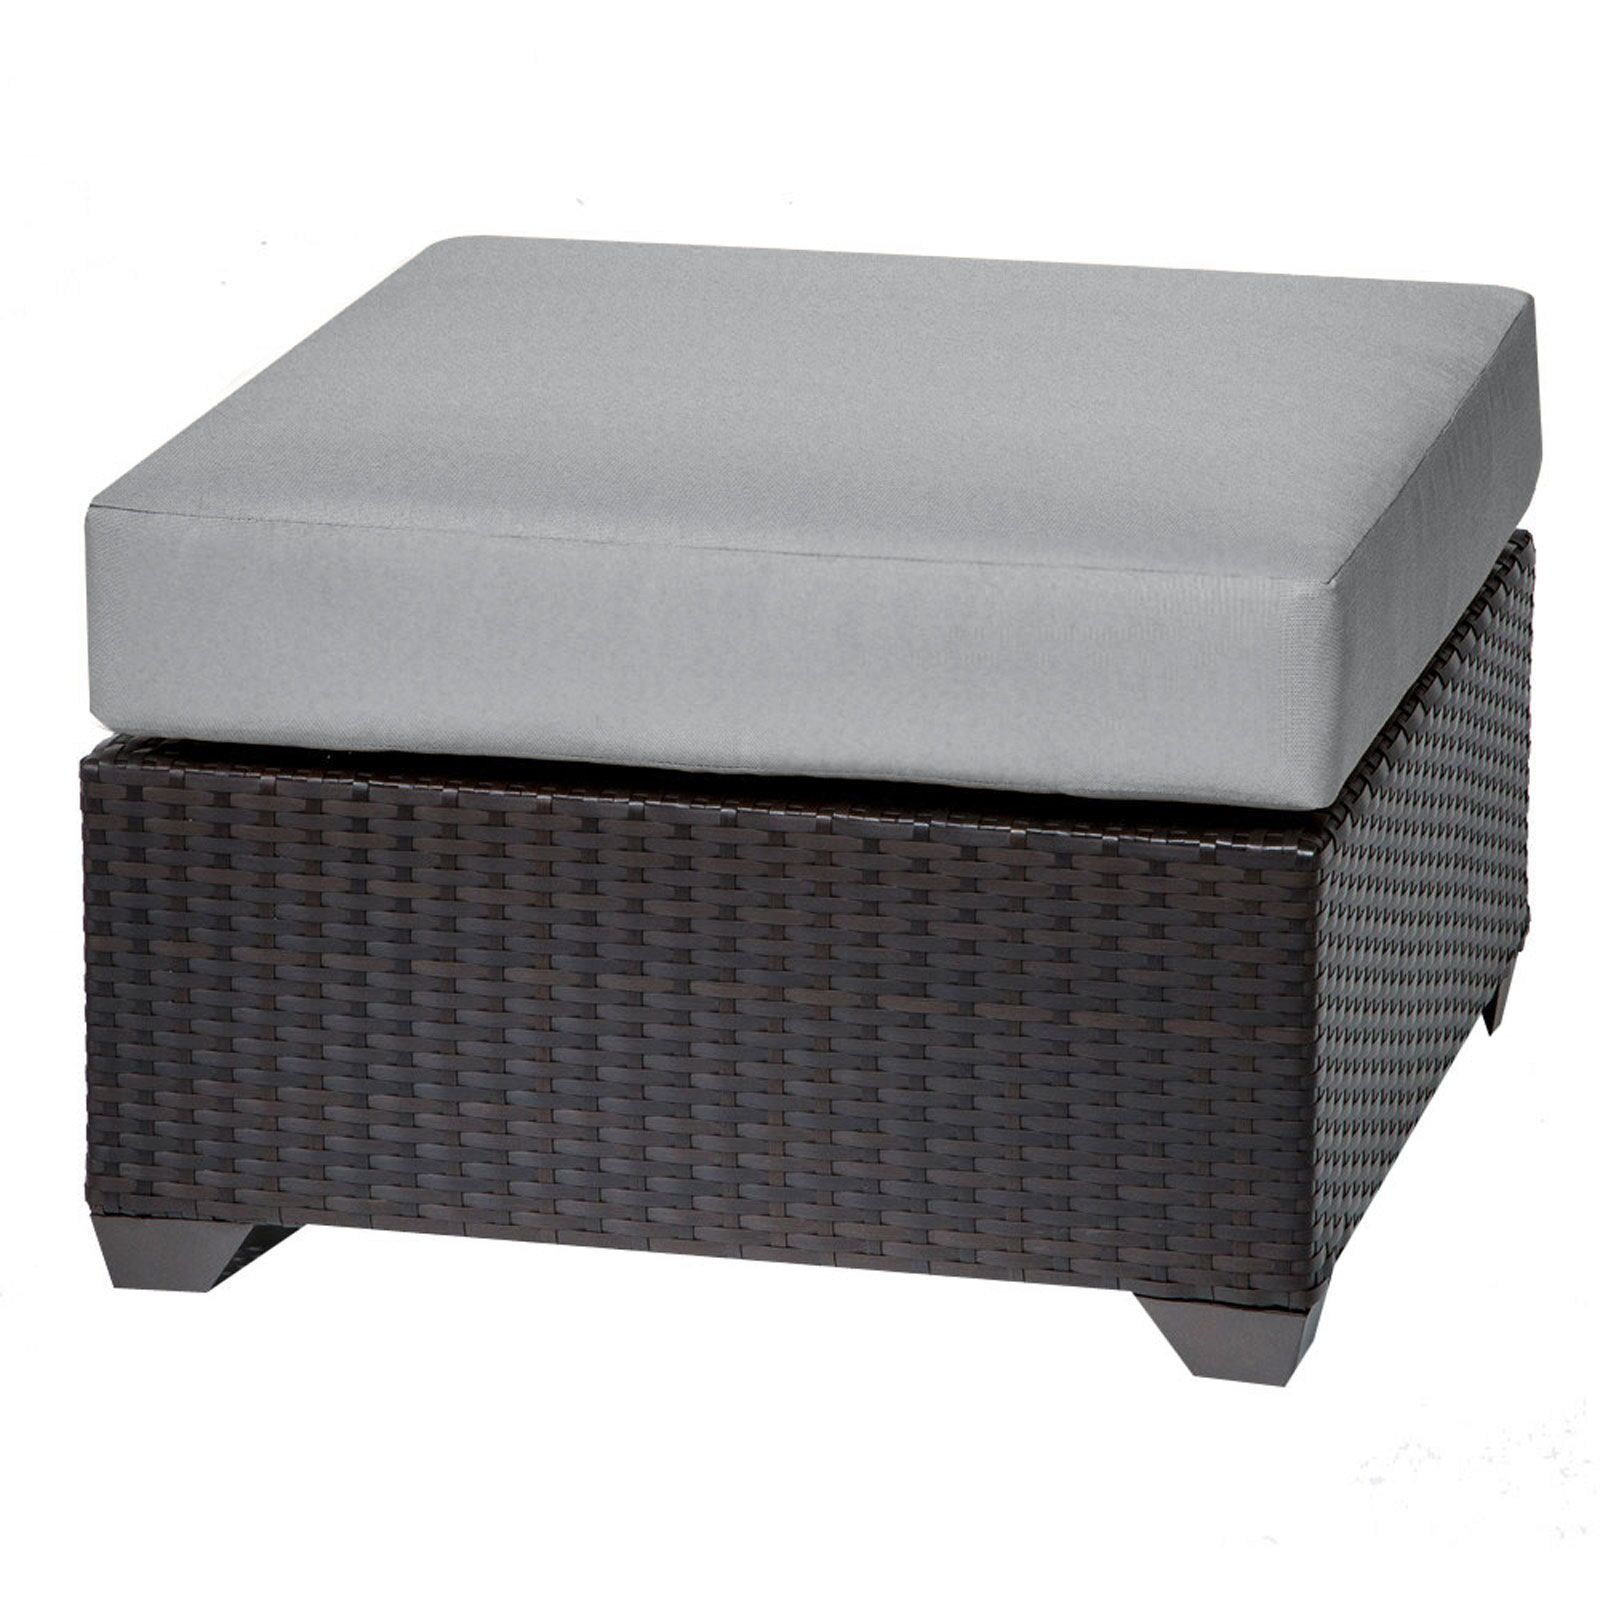 Barbados Ottoman with Cushion Color: Gray